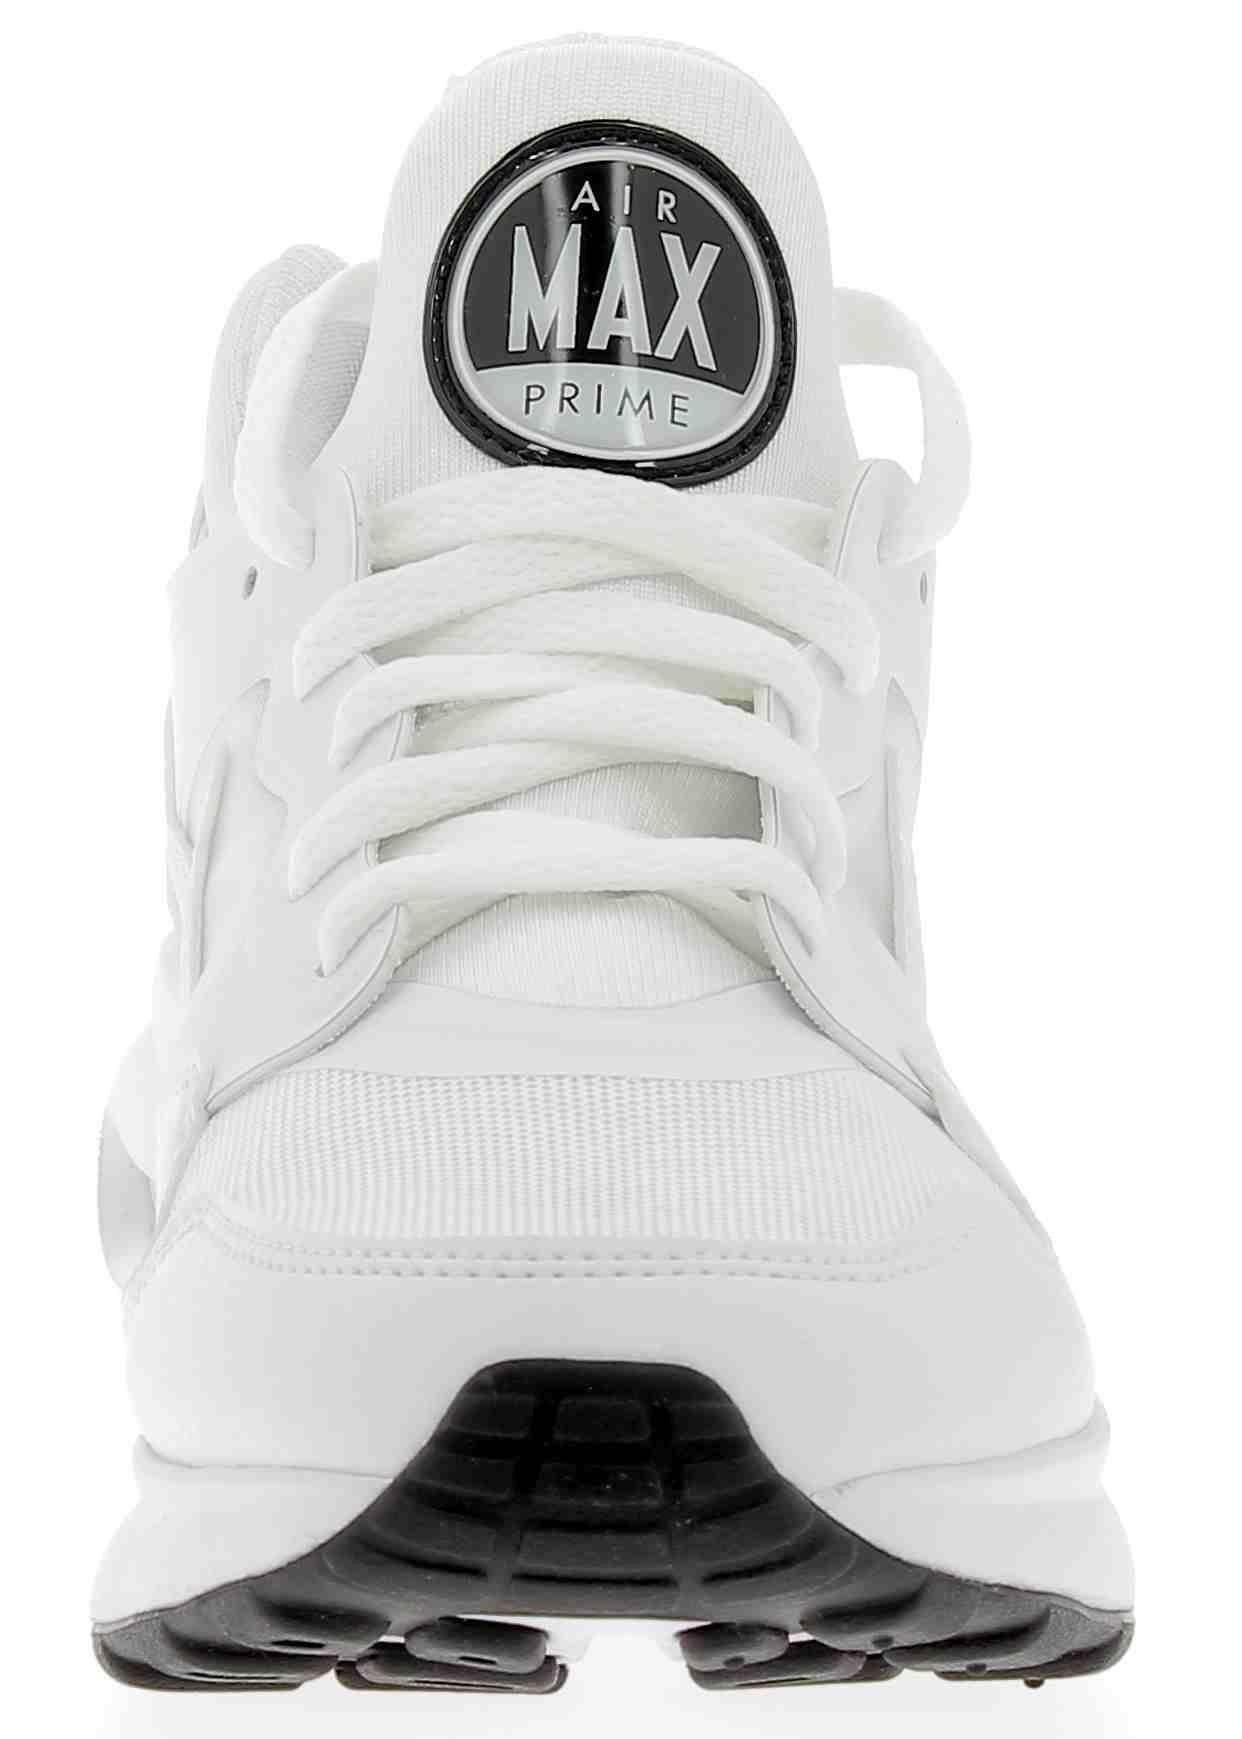 air max prime bianche